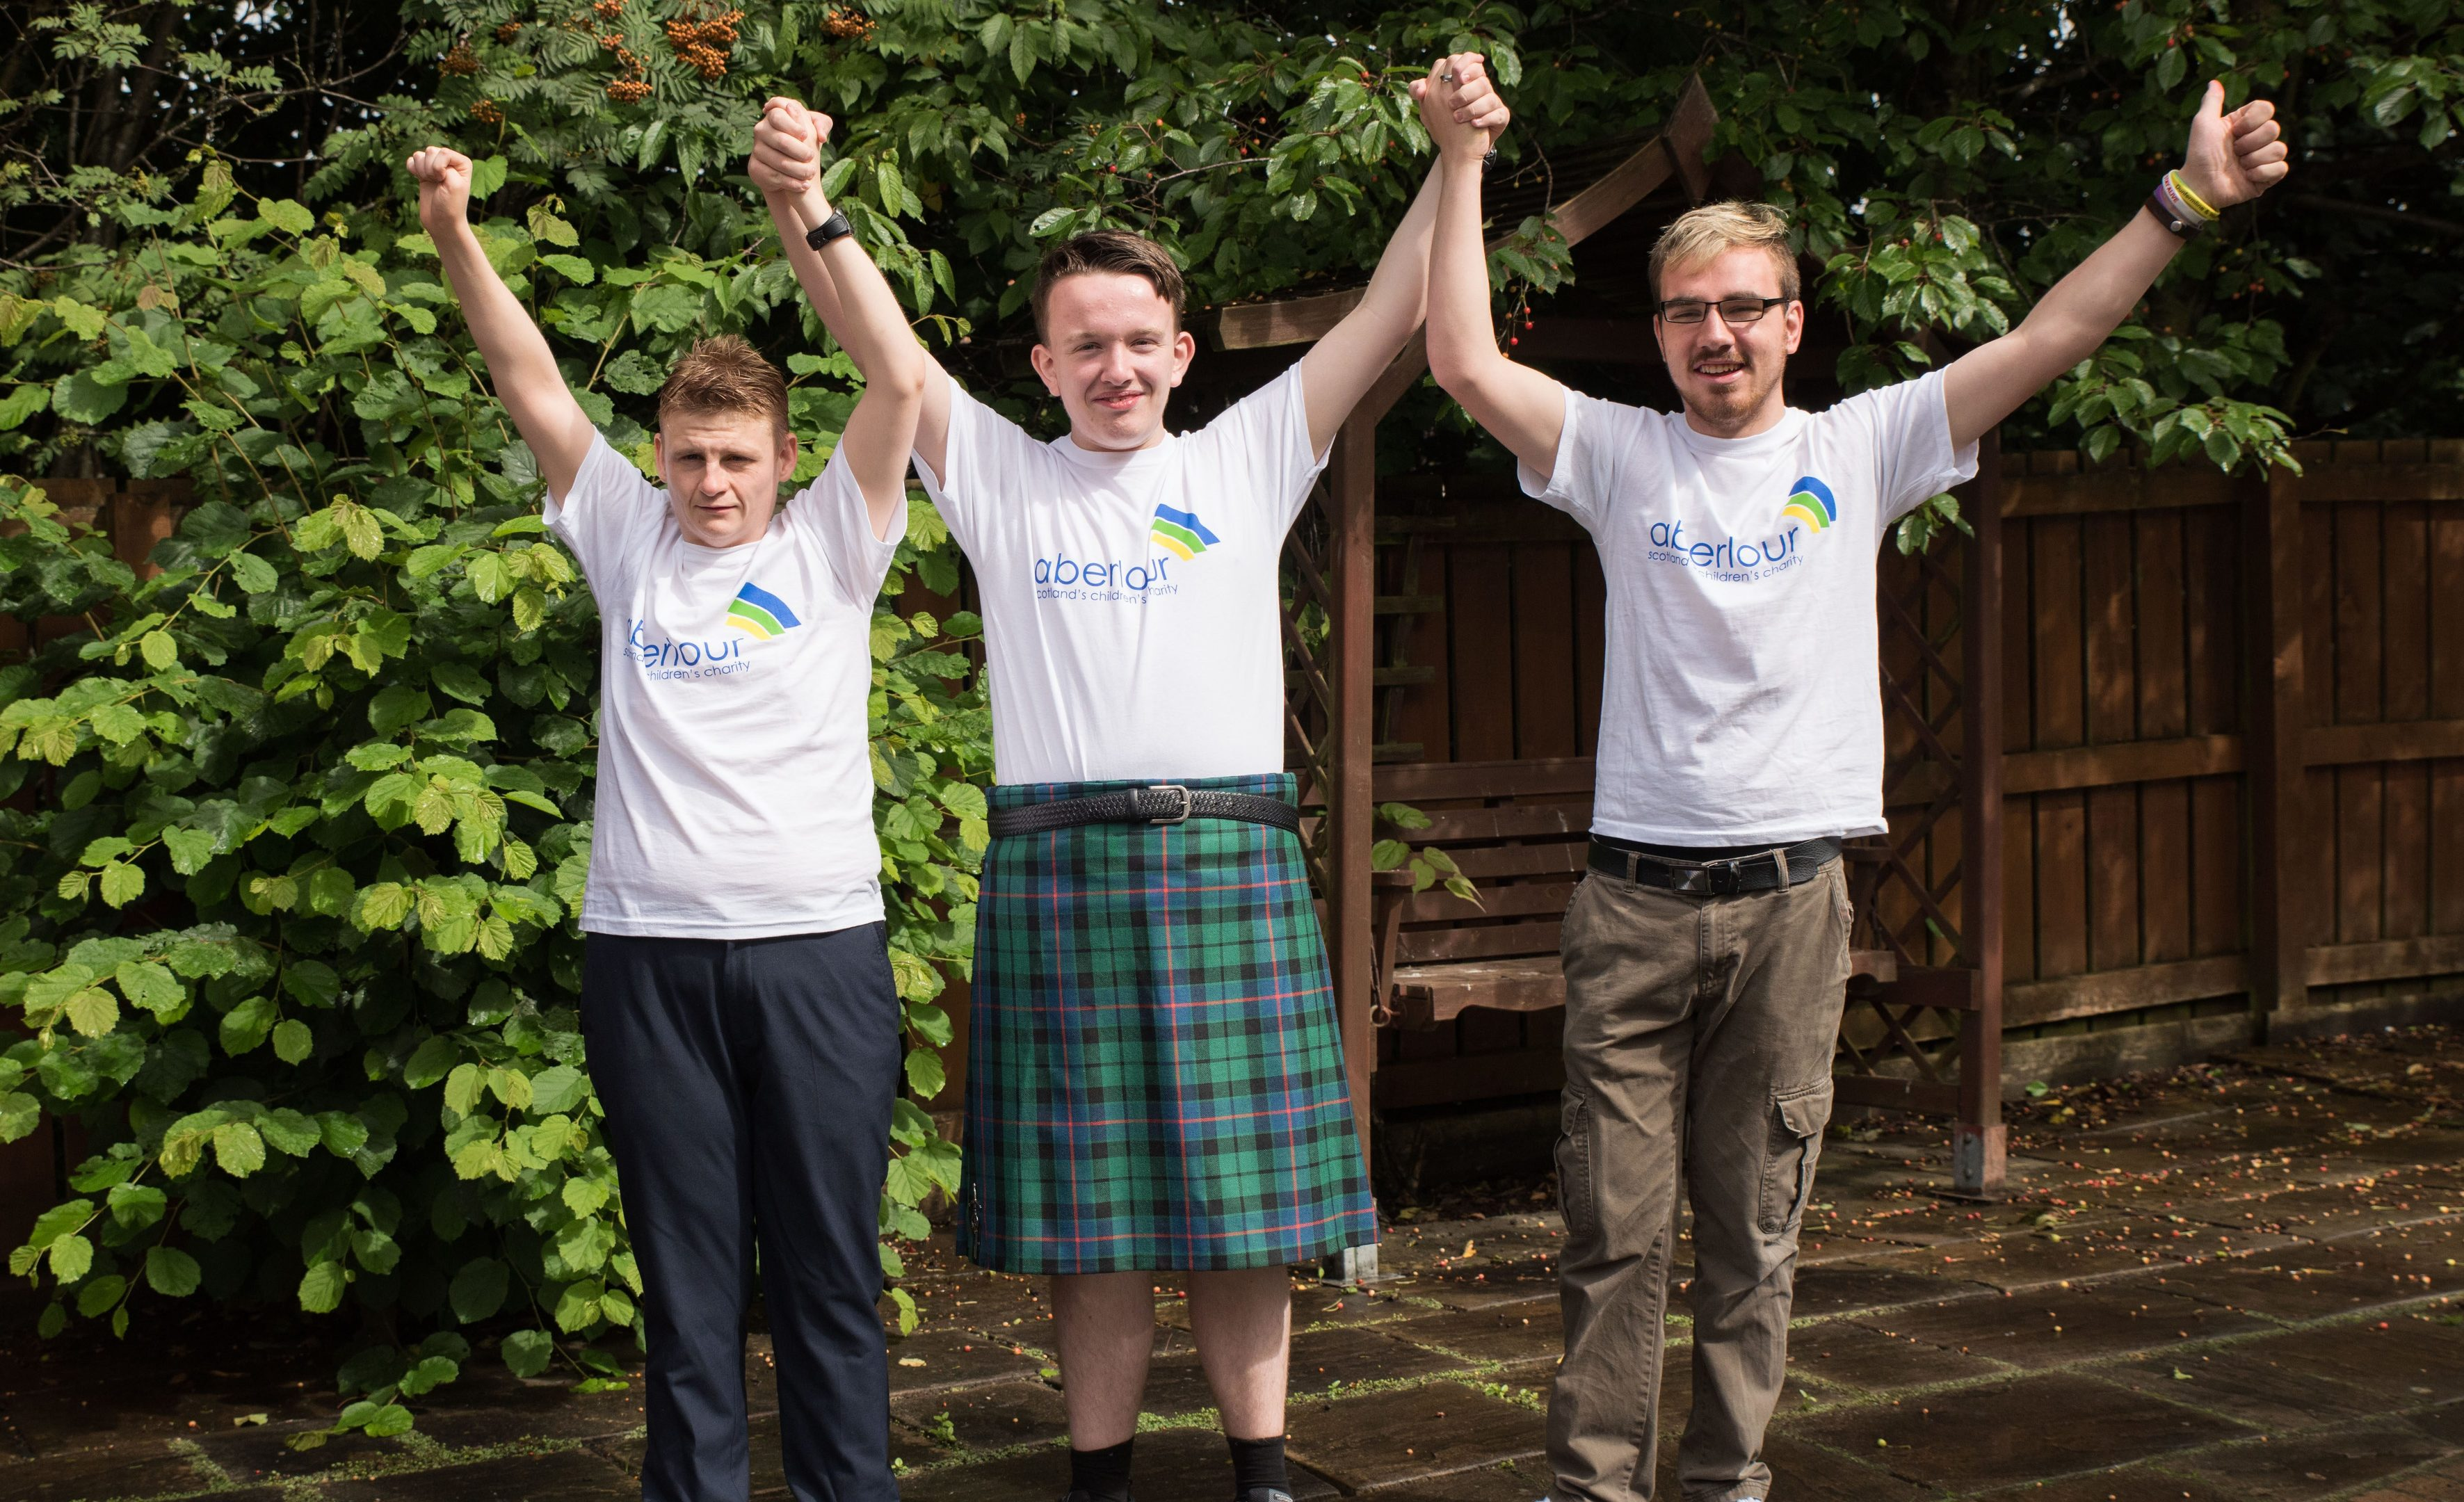 Brandon Anderson, Robert Morrison and Jamie Thomas raised cash for Aberlour by doing the Kiltwalk.